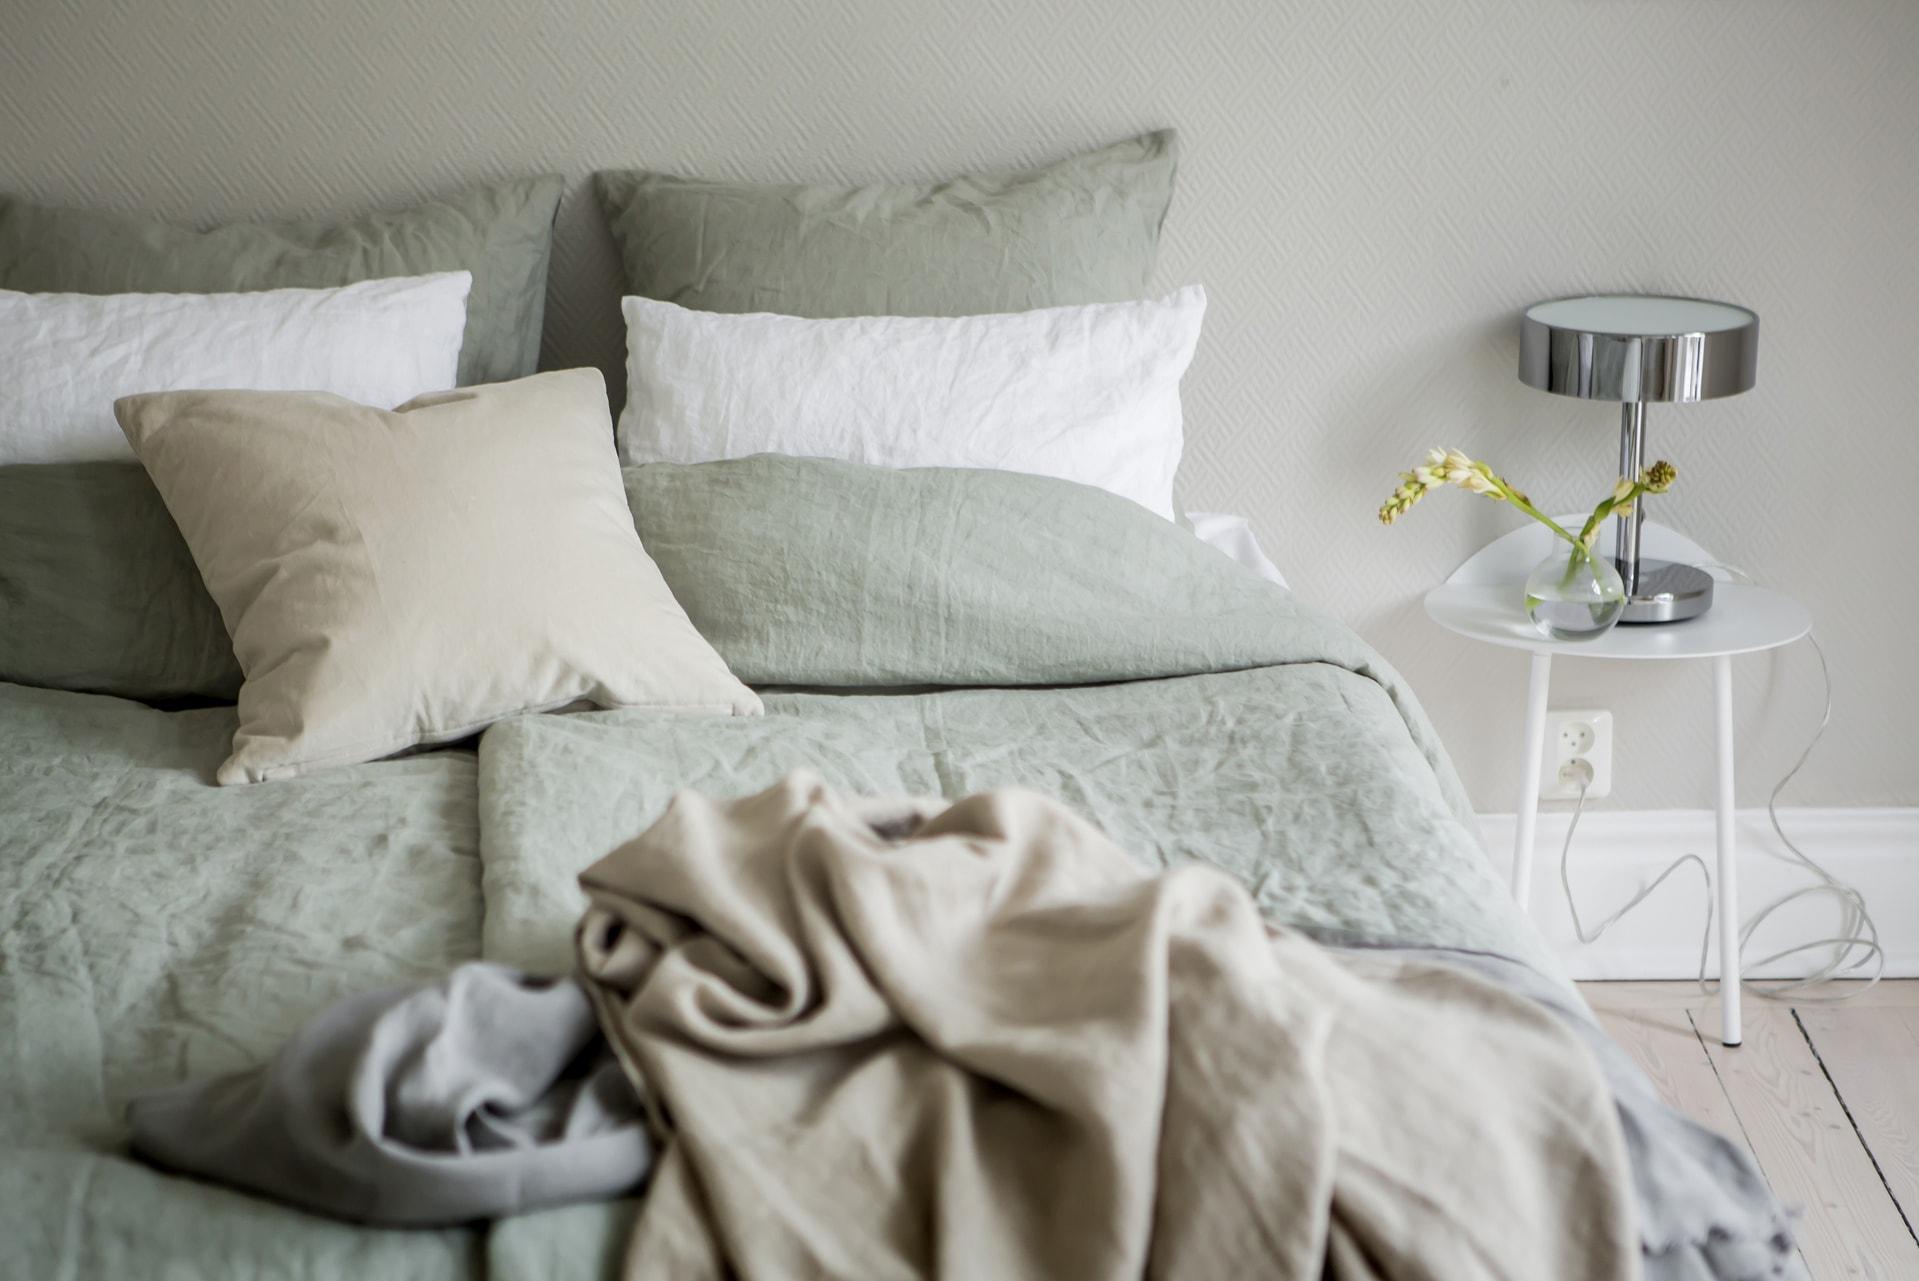 Znalezione obrazy dla zapytania spring bedroom